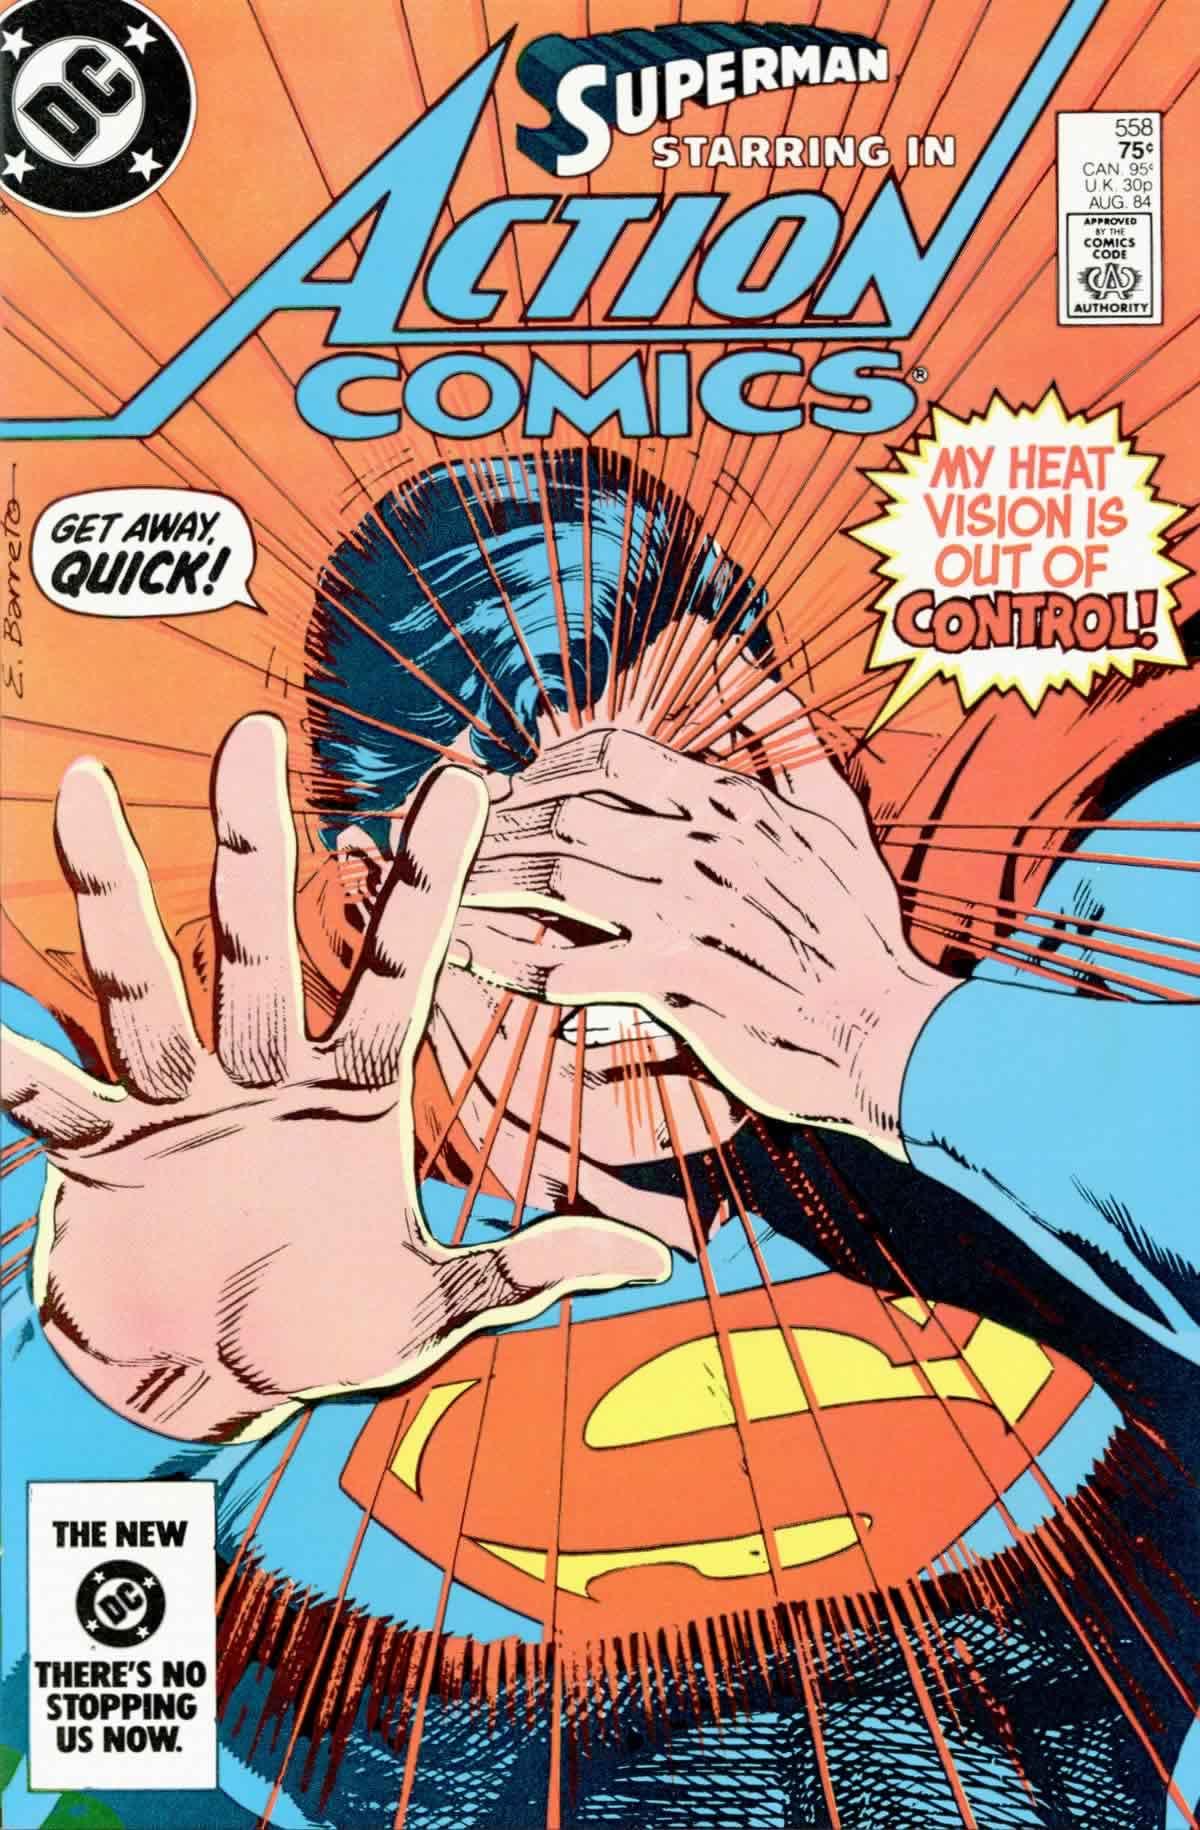 Action Comics (1938) 558 Page 1